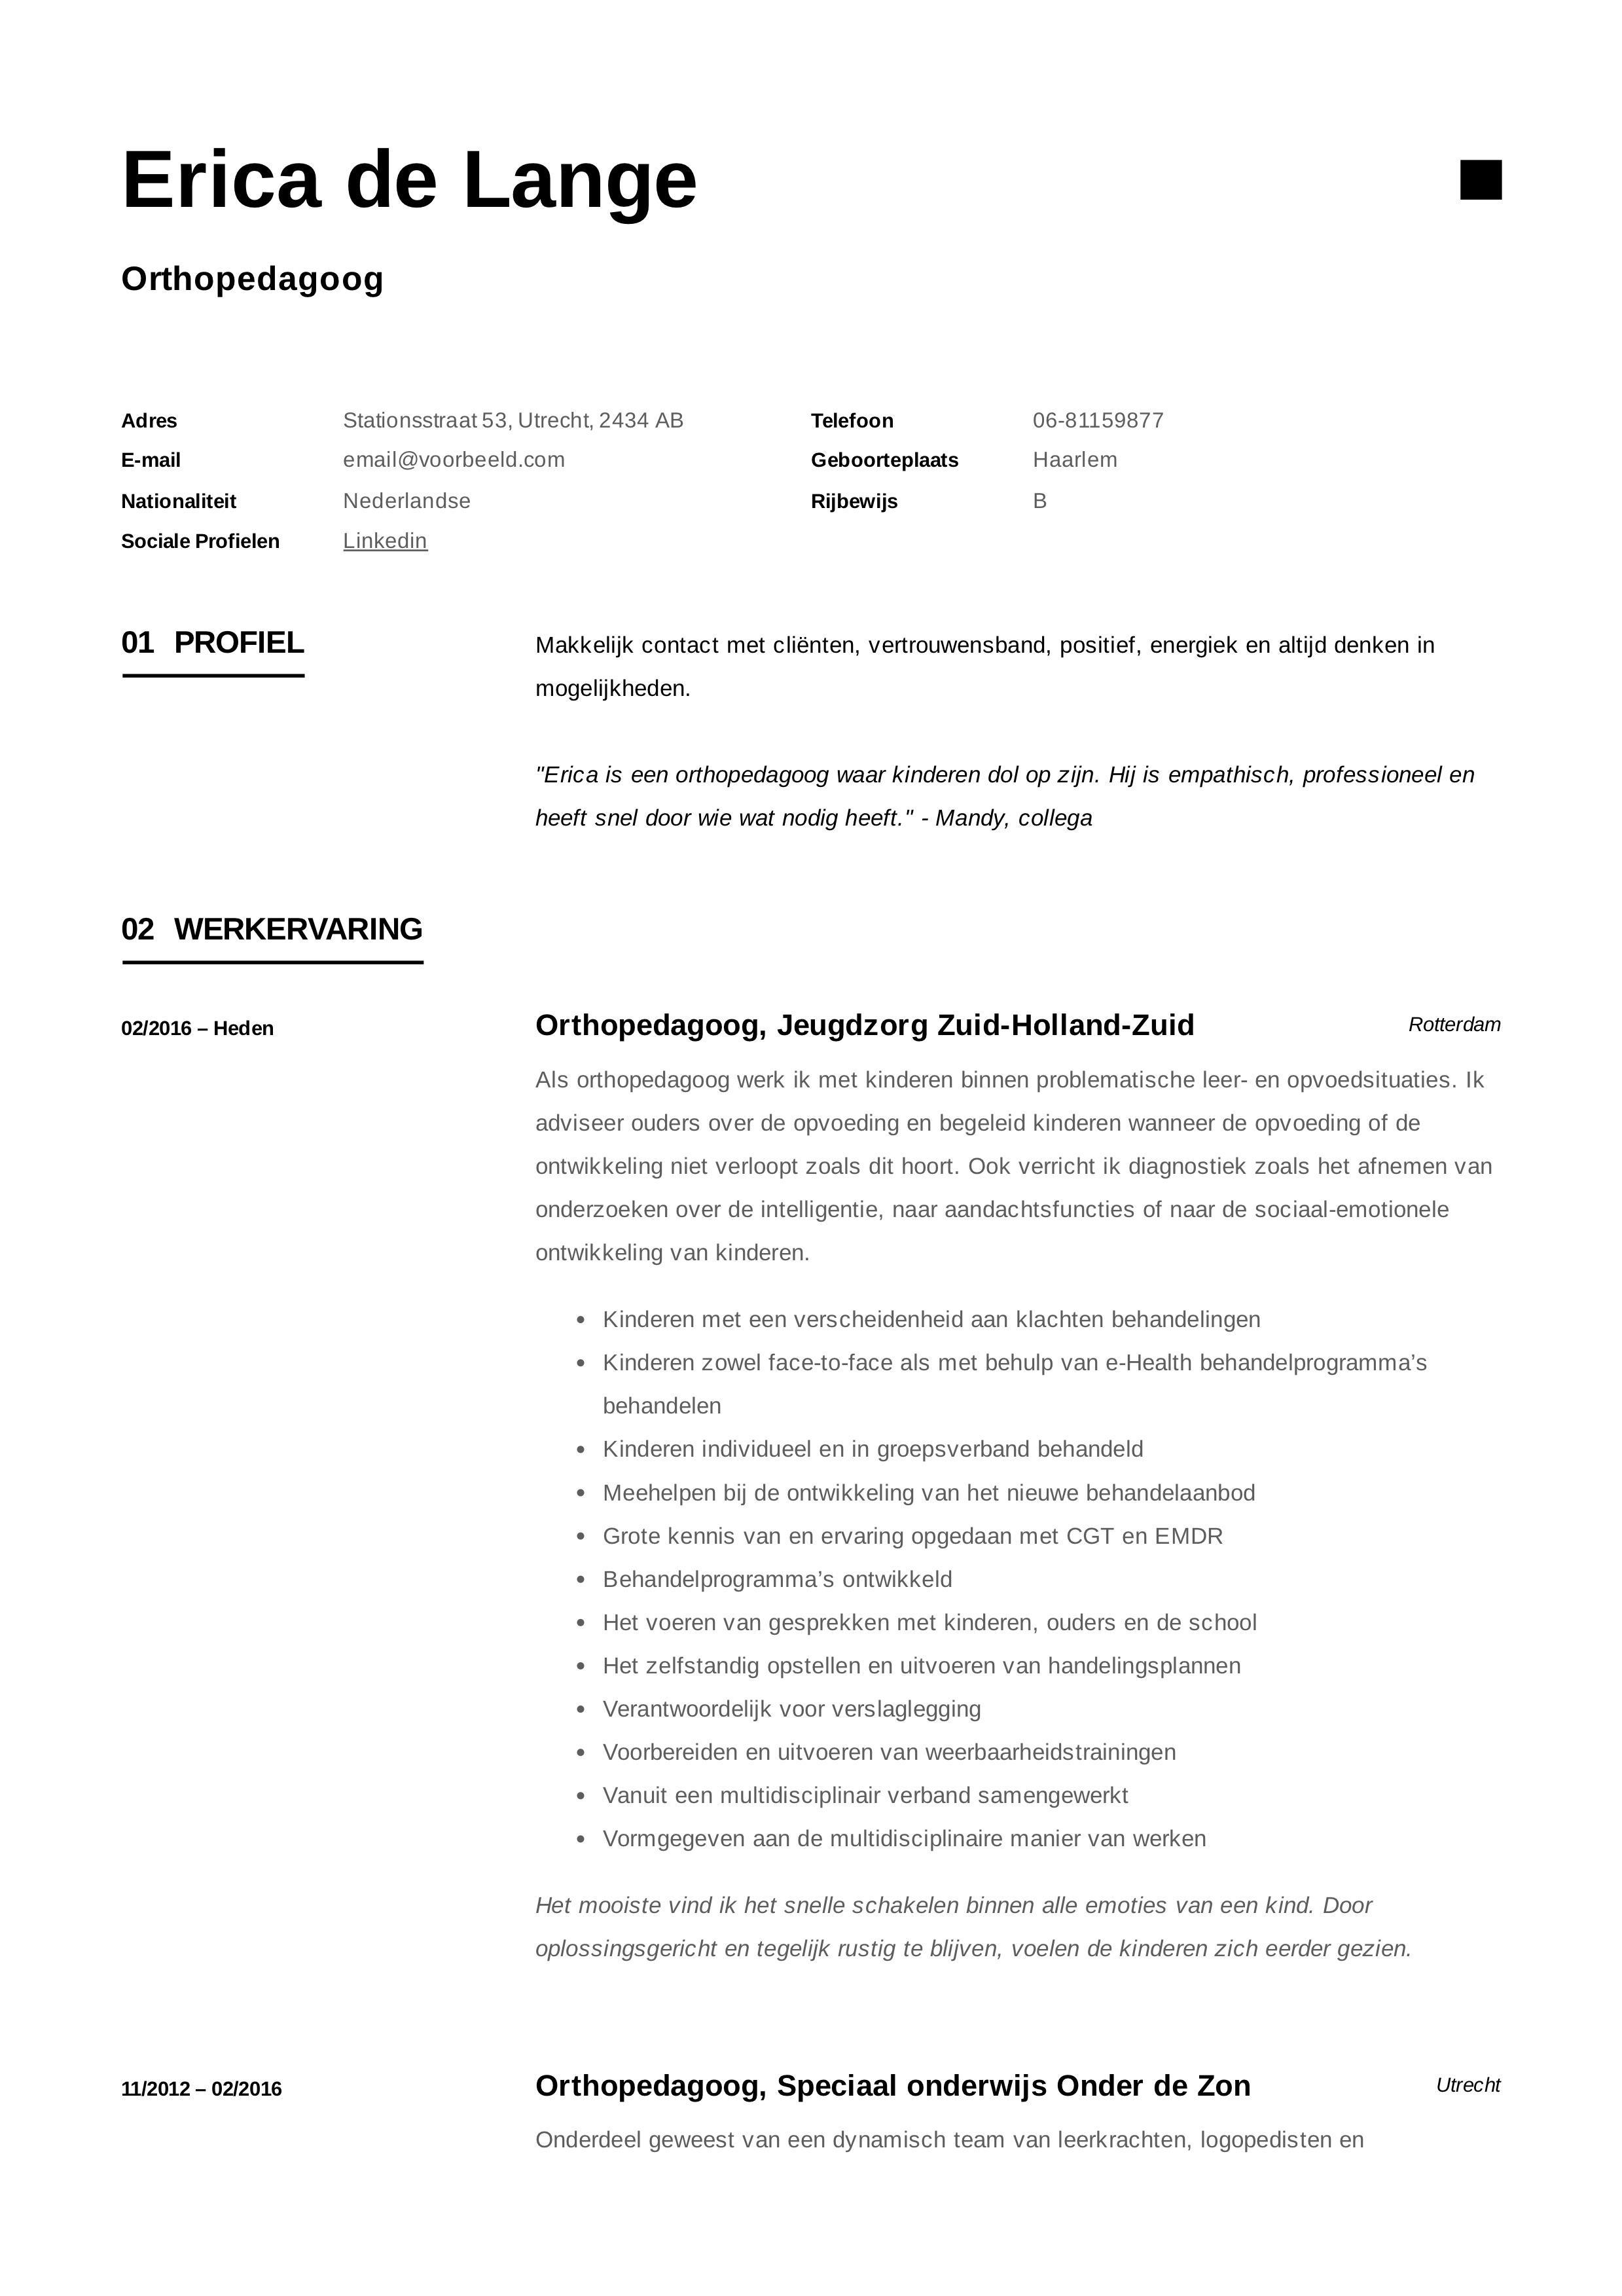 CV Orthopedagoog (10)